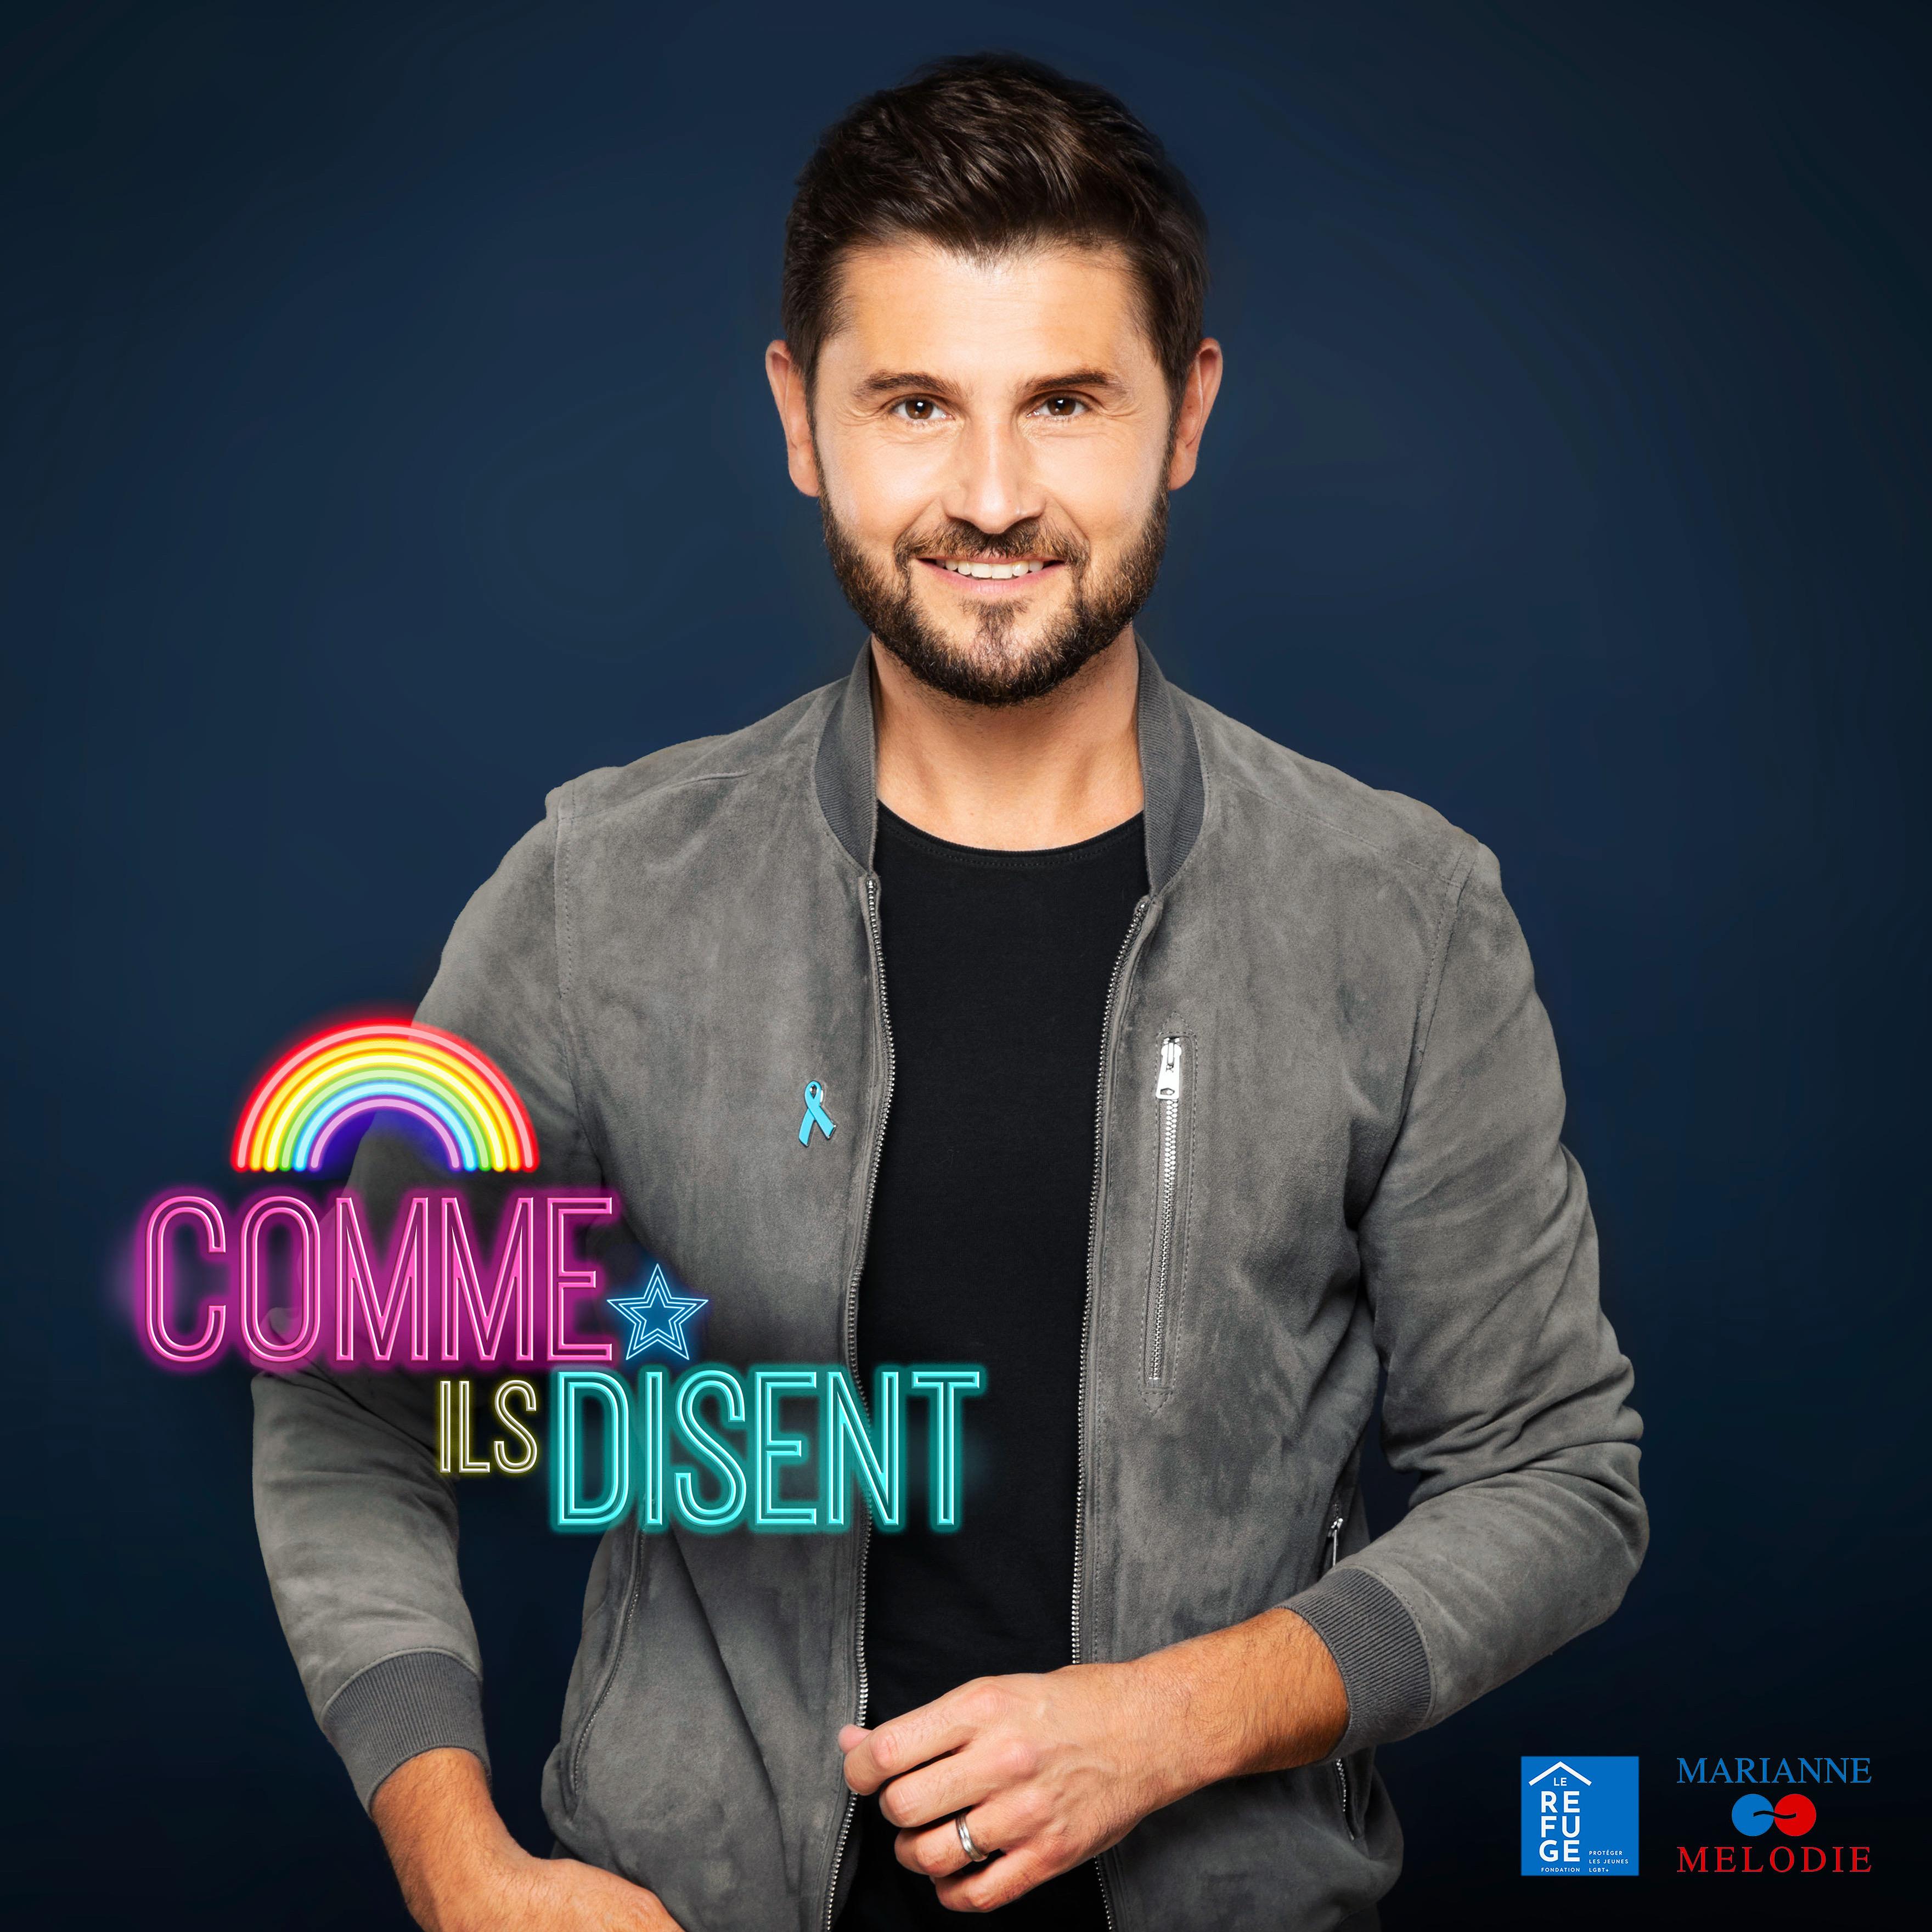 Christophe Beaugrand